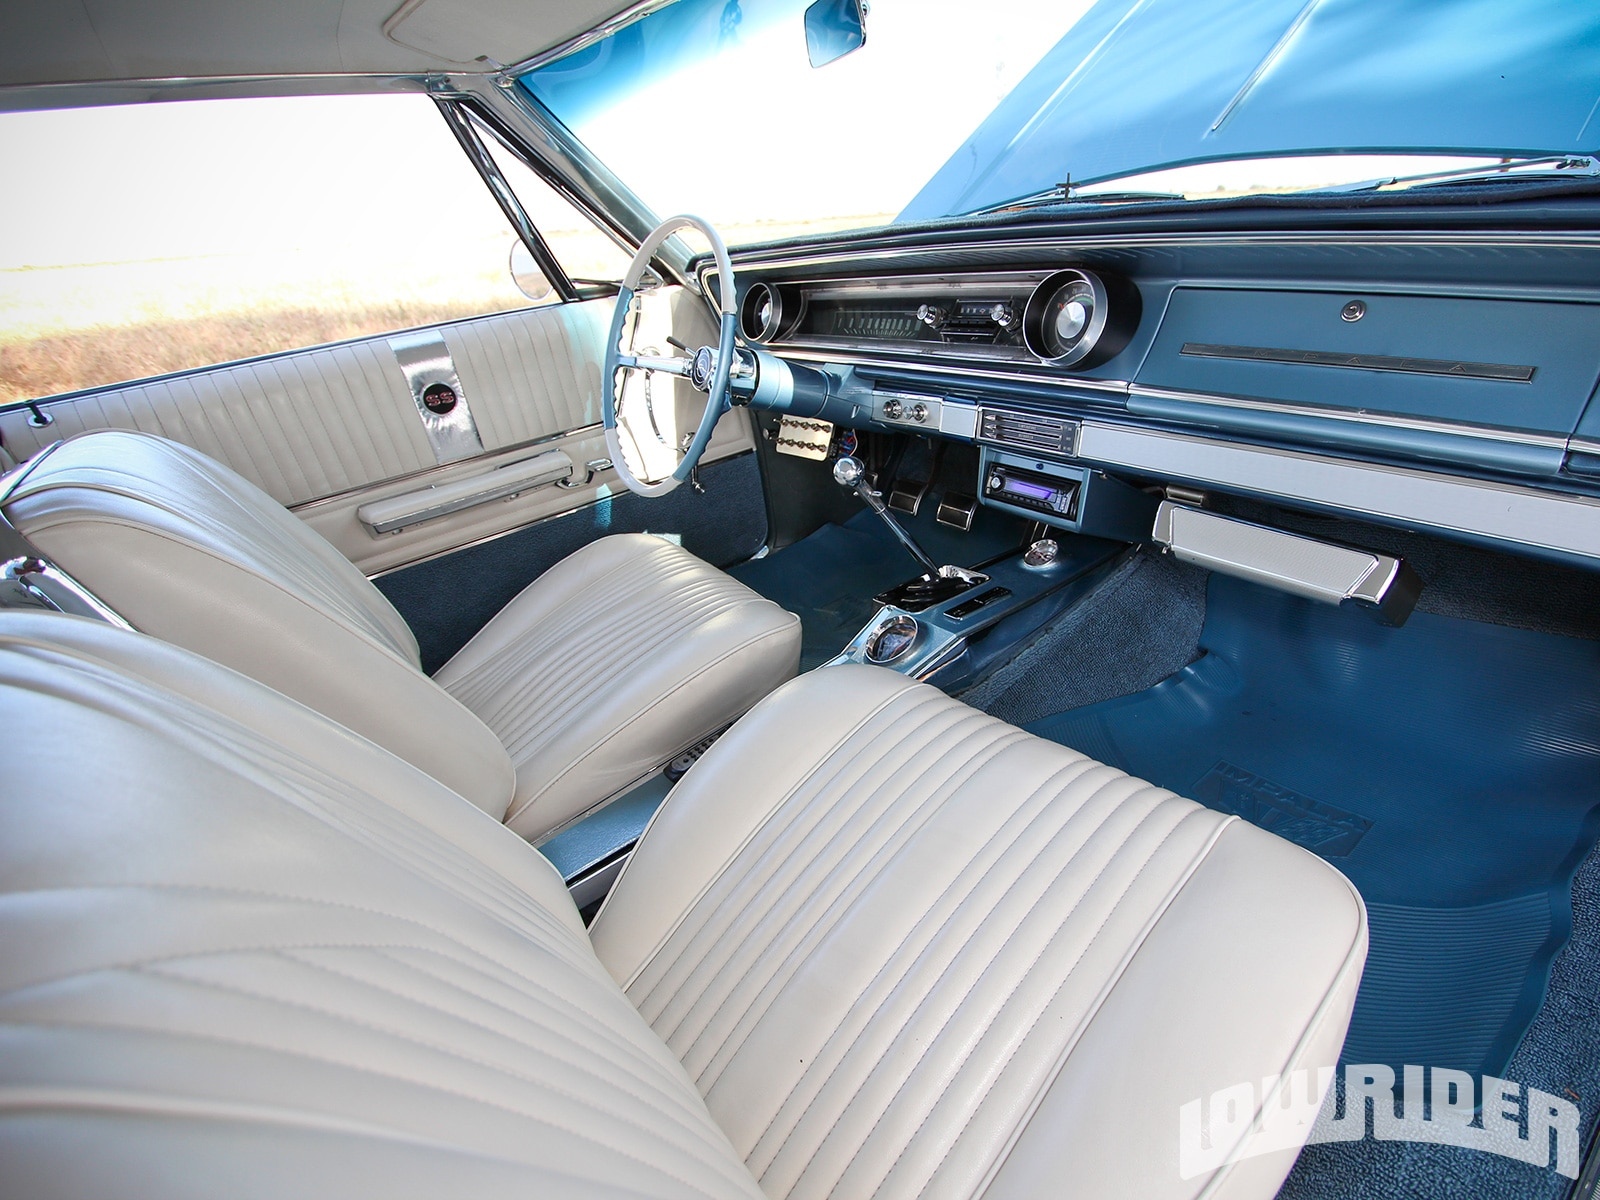 1965 chevrolet impala lowrider magazine for Chevrolet impala 2013 interior